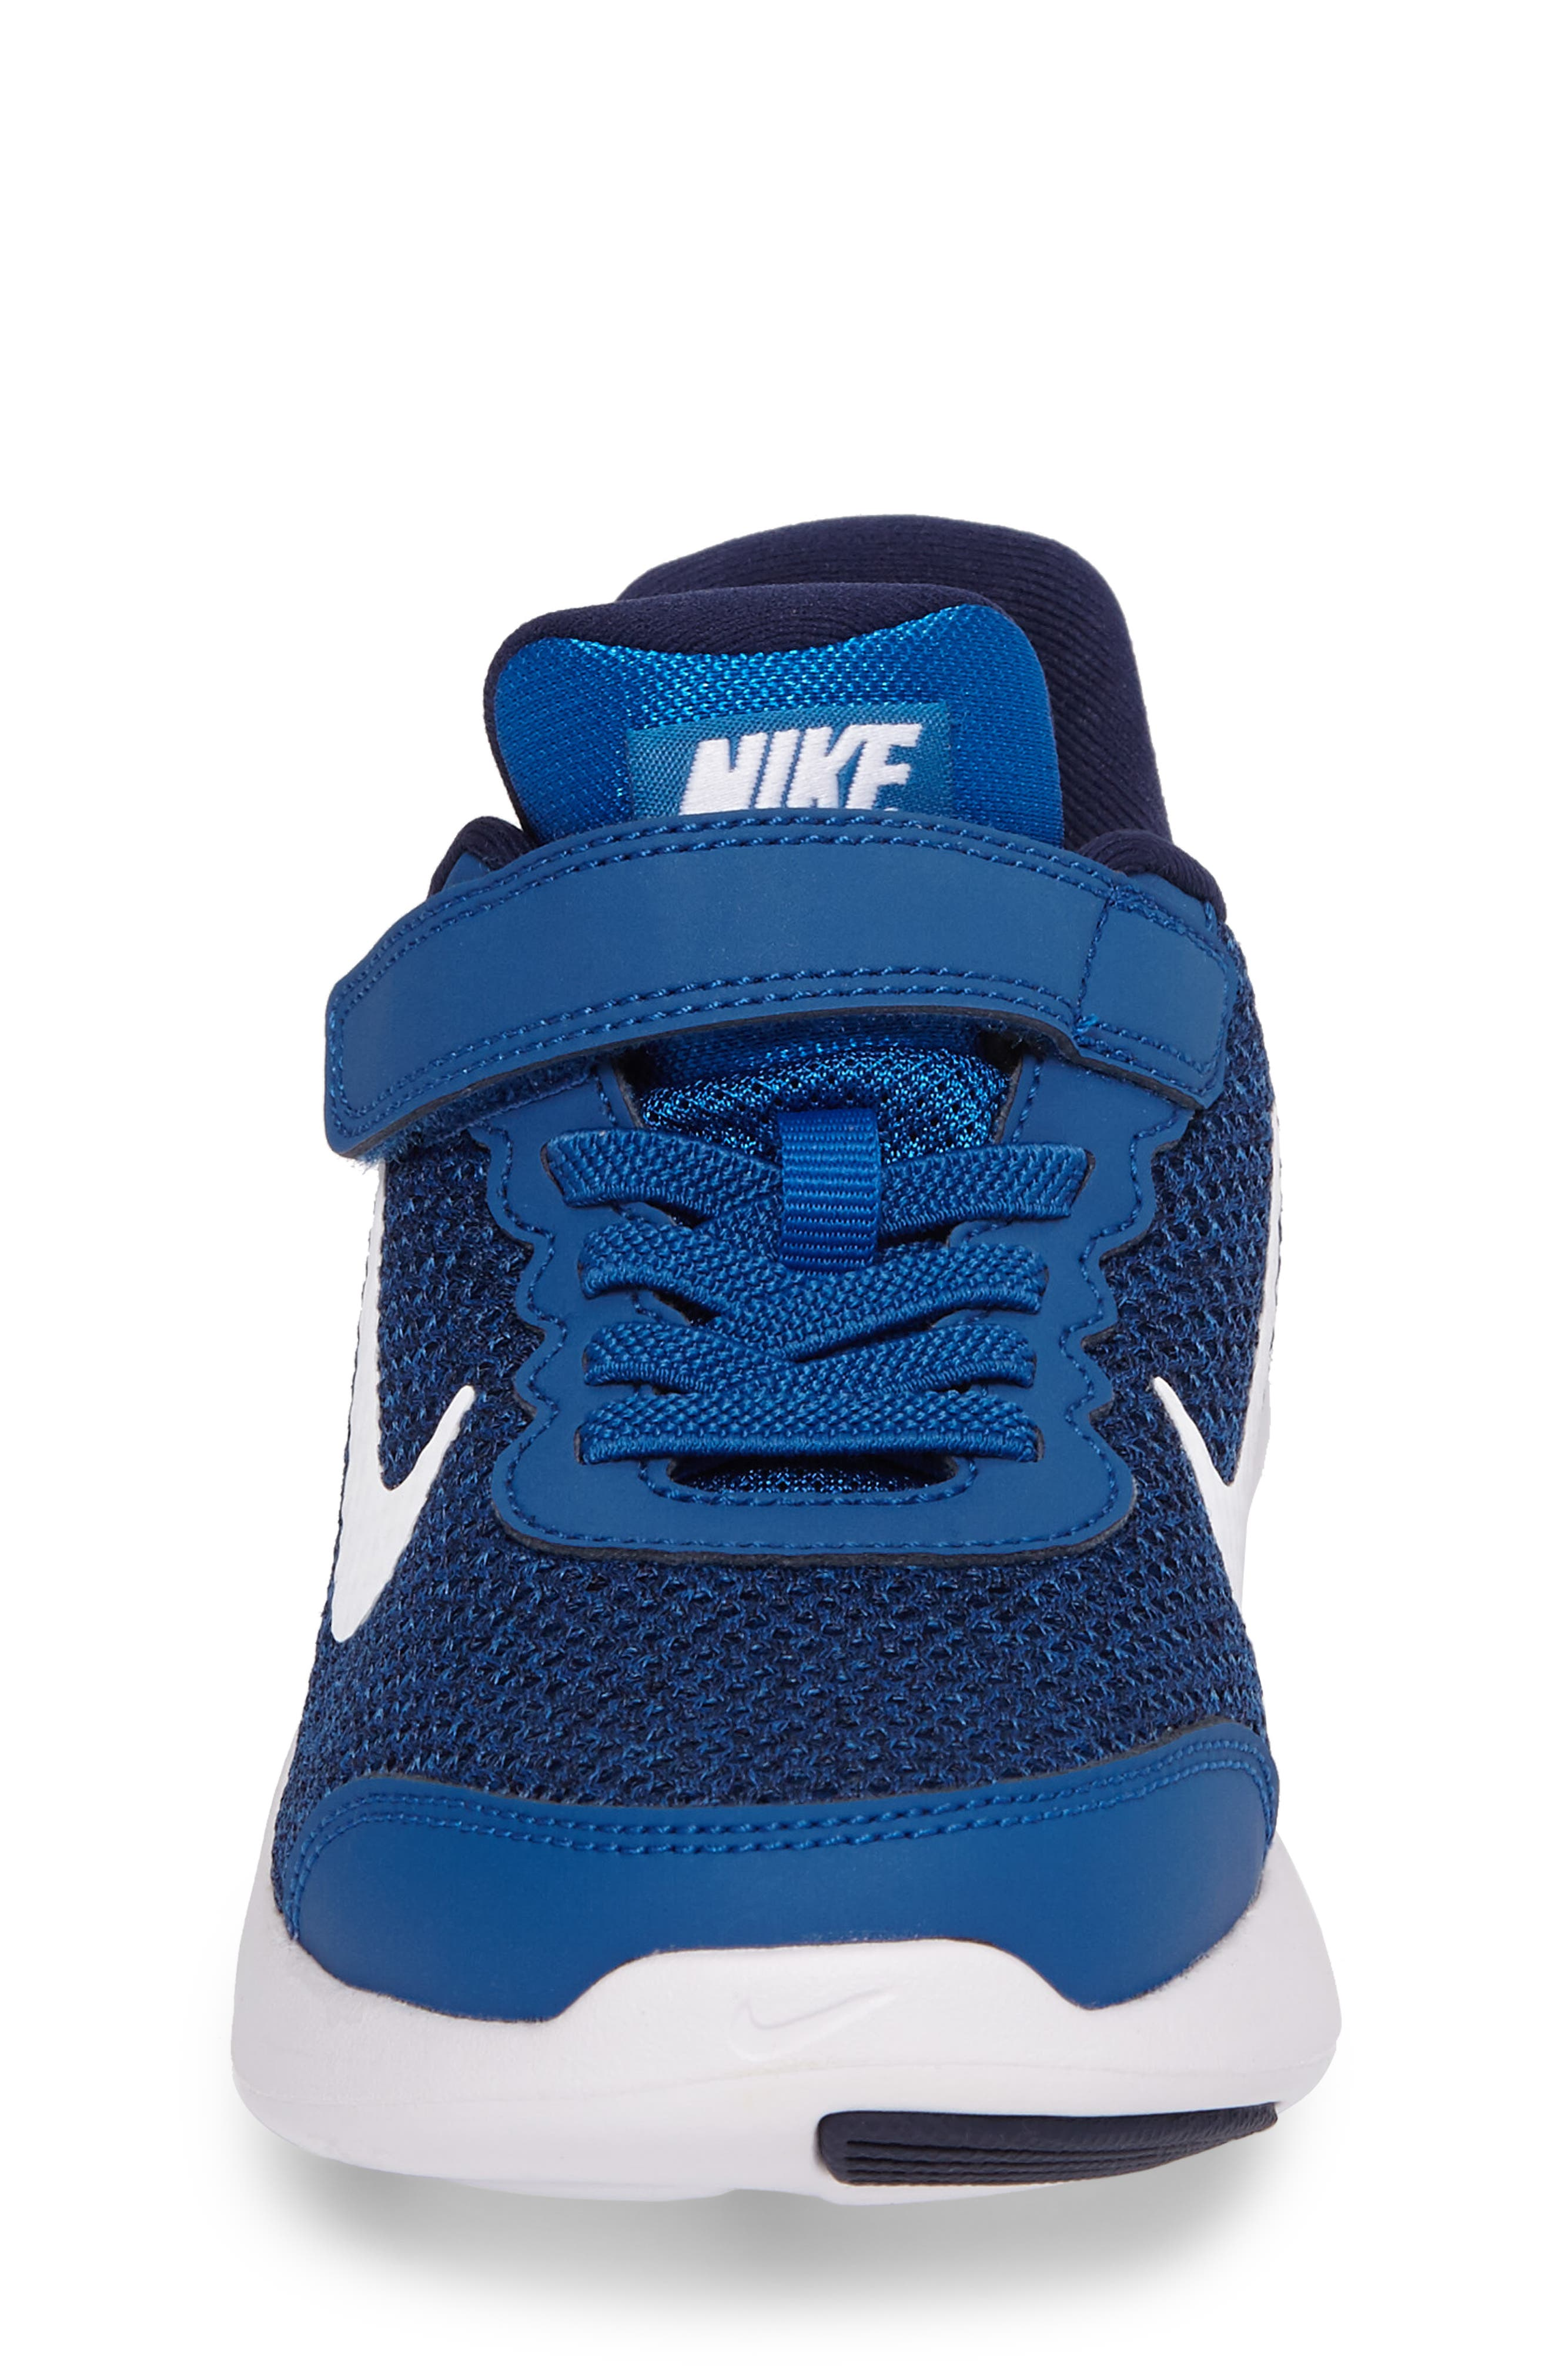 Lunar Apparent Sneaker,                             Alternate thumbnail 4, color,                             Blue Jay/ White/ Binary Blue